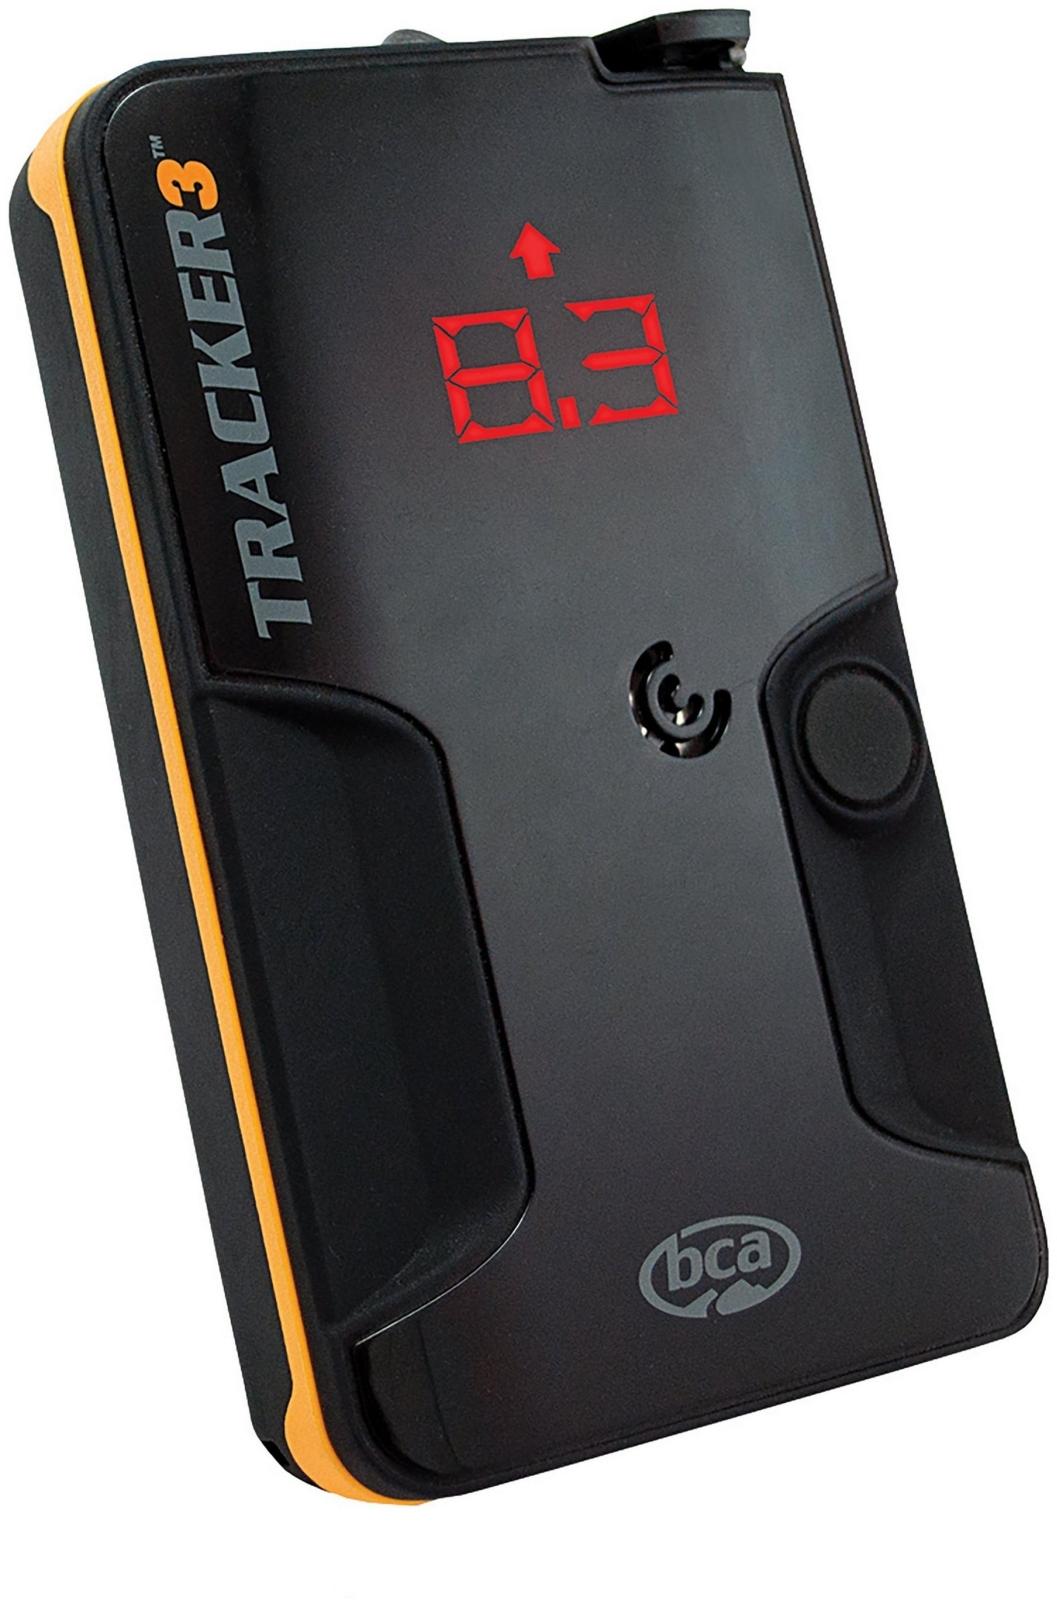 BCA Tracker 3 uni